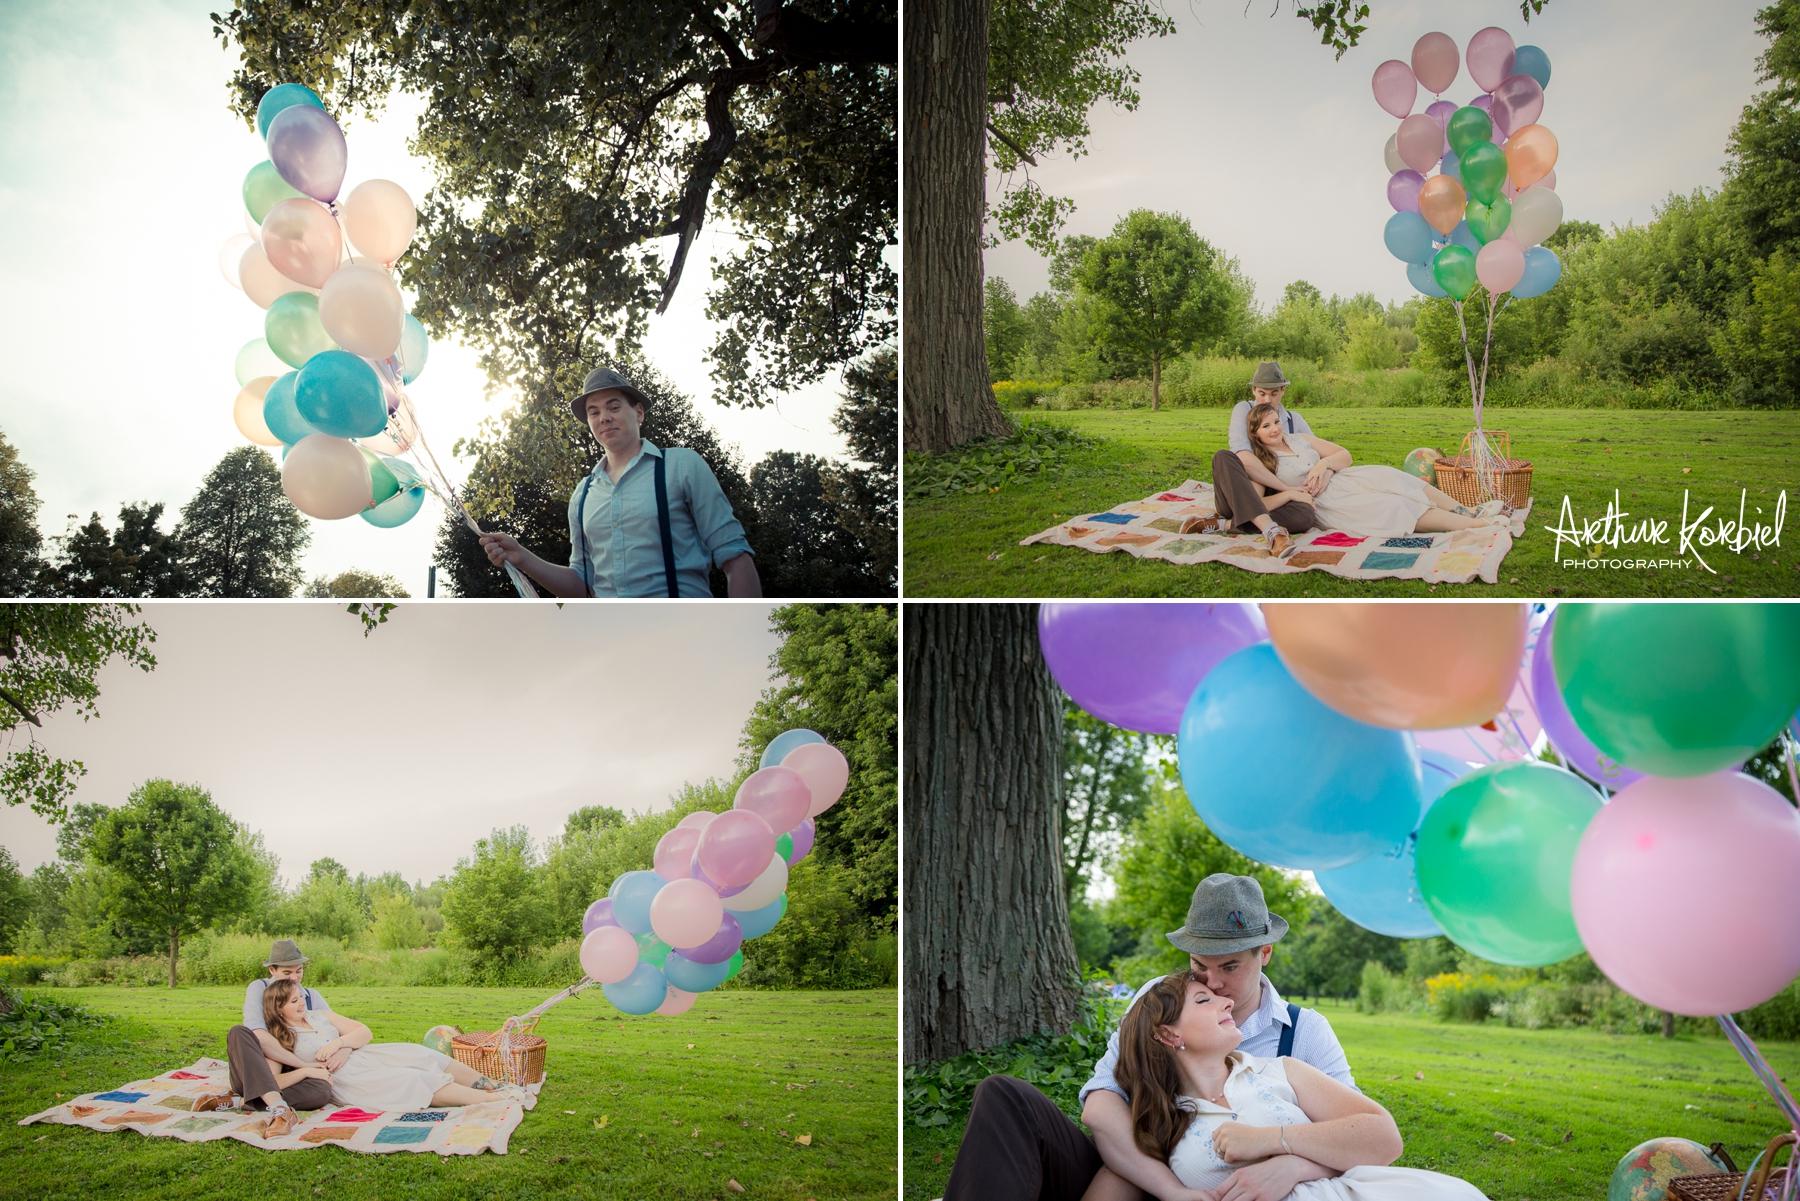 Arthur Korbiel Photography - London Engagement Wedding Photographer - Vintage - Bag Lady Variety - Gibbons Park_010.jpg